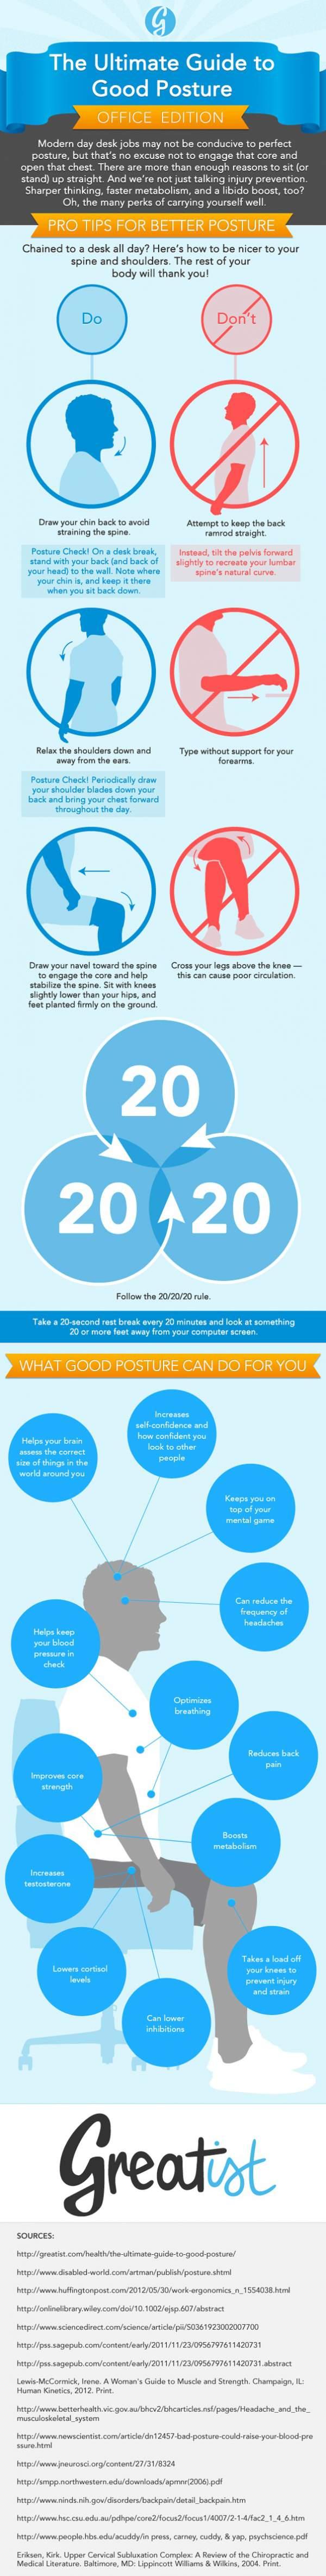 Infografik zur richtigen Körperhaltung am Arbeitsplatz